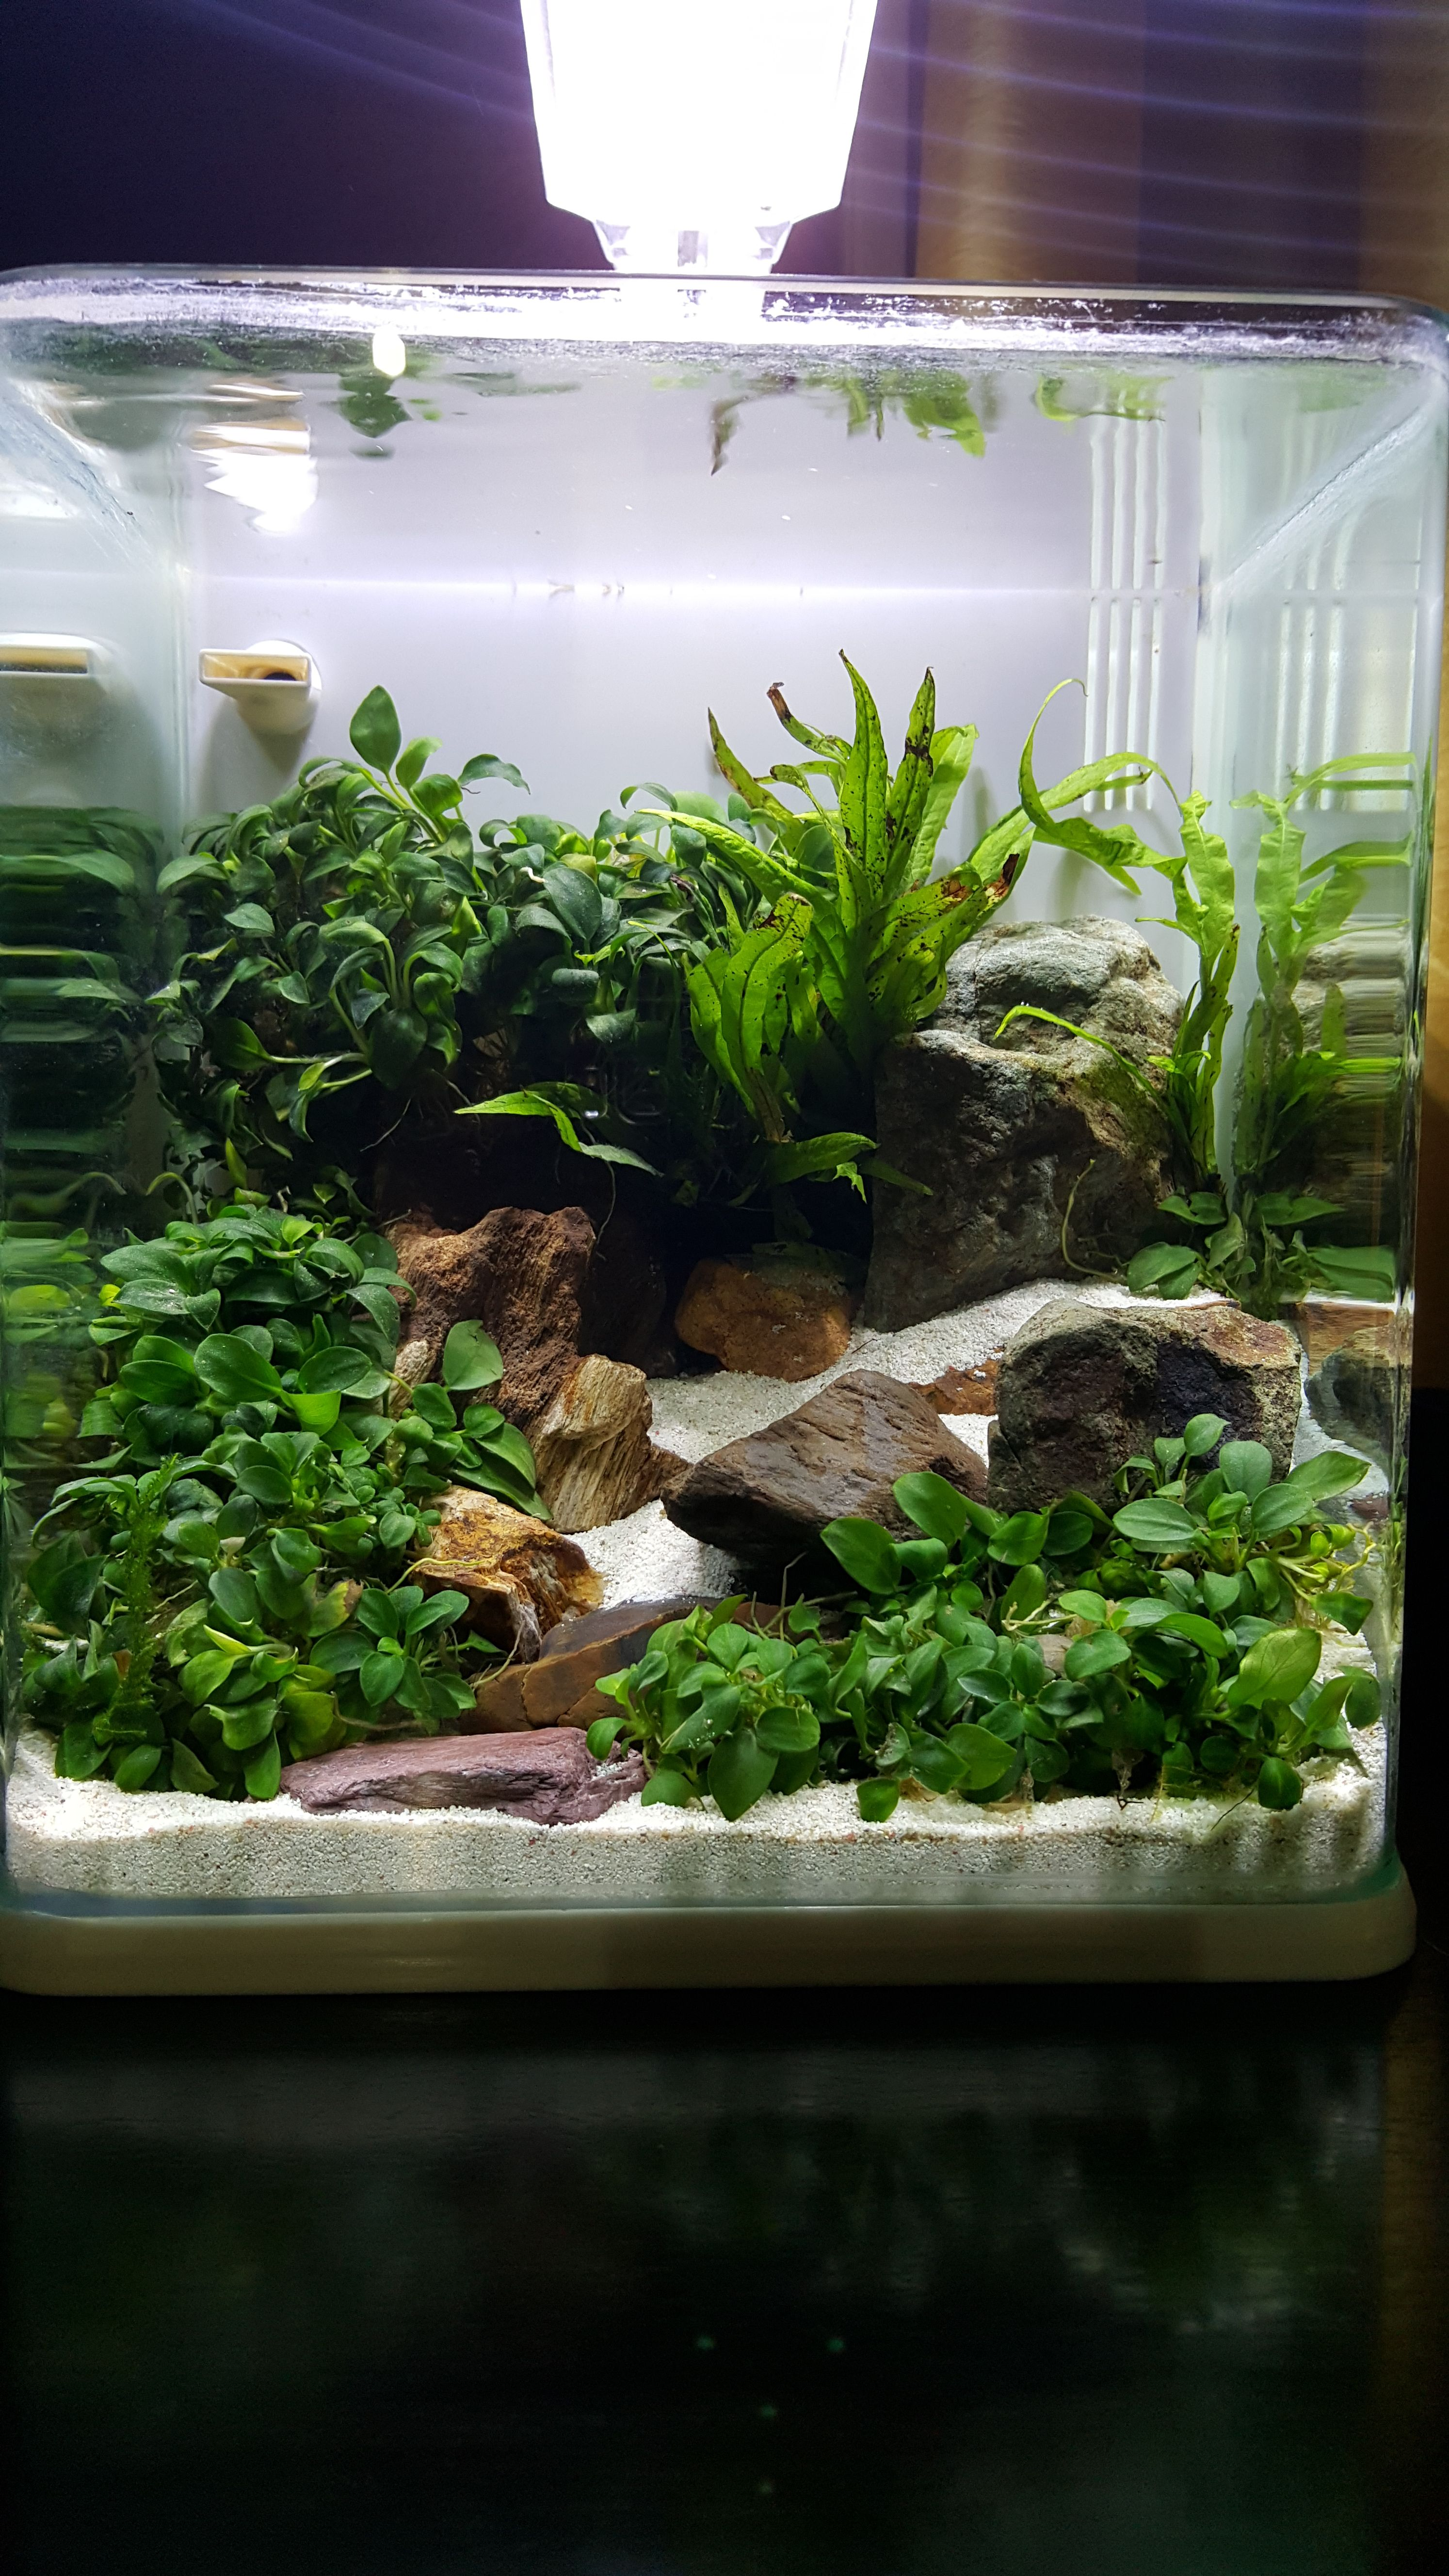 How To Control Algae In A Aquarium Stop Algae Growth For Good